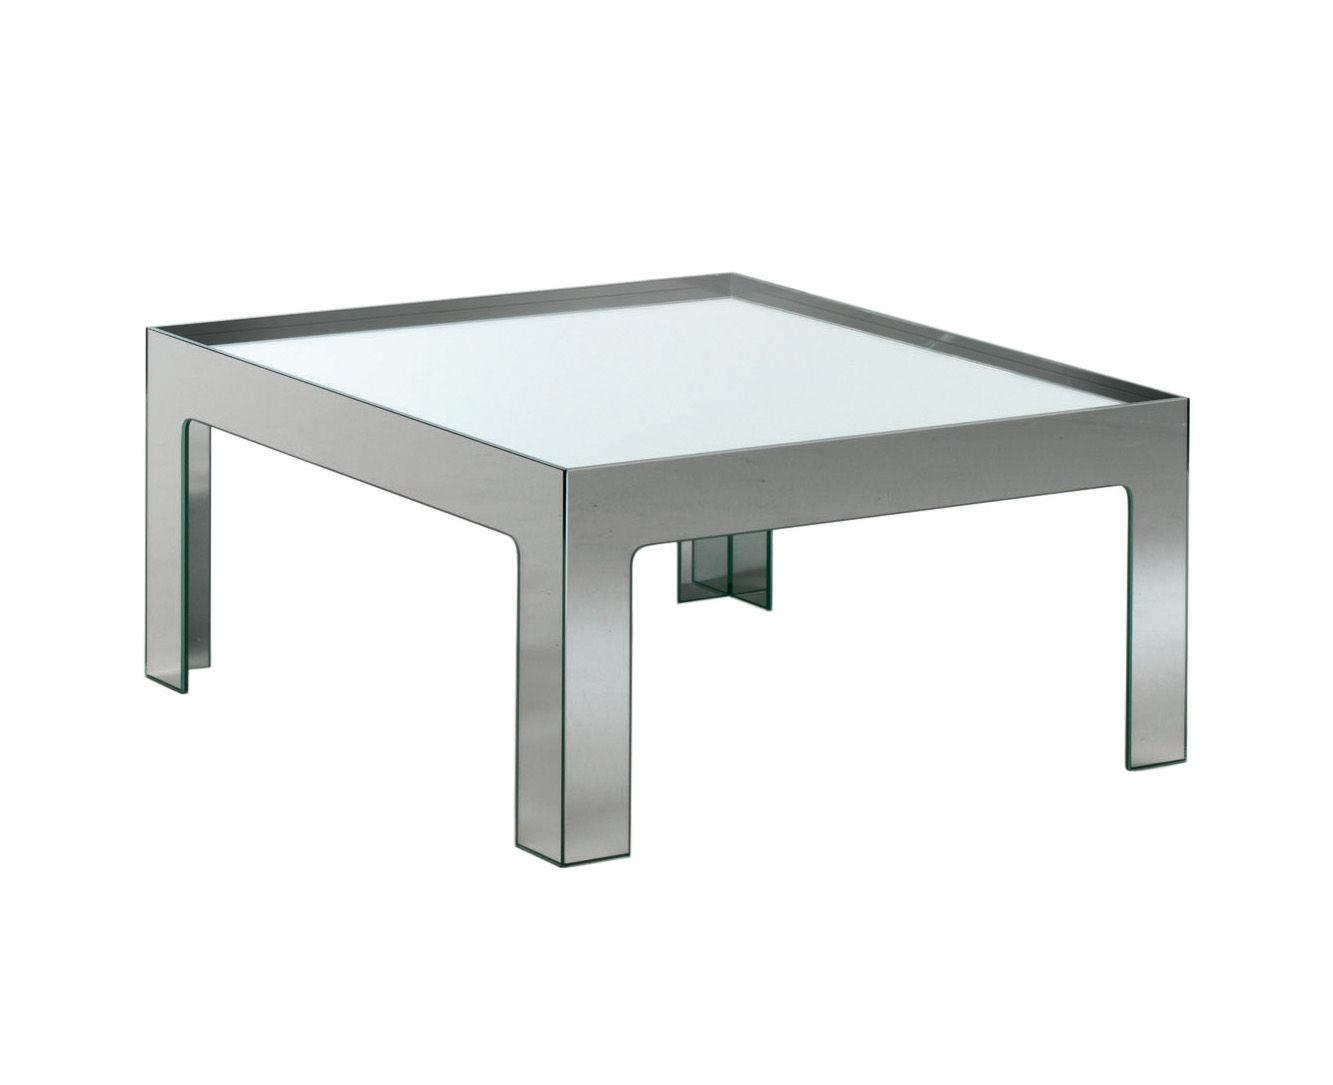 mirror mirror coffee table 70 x 70 cm mirror by glas italia